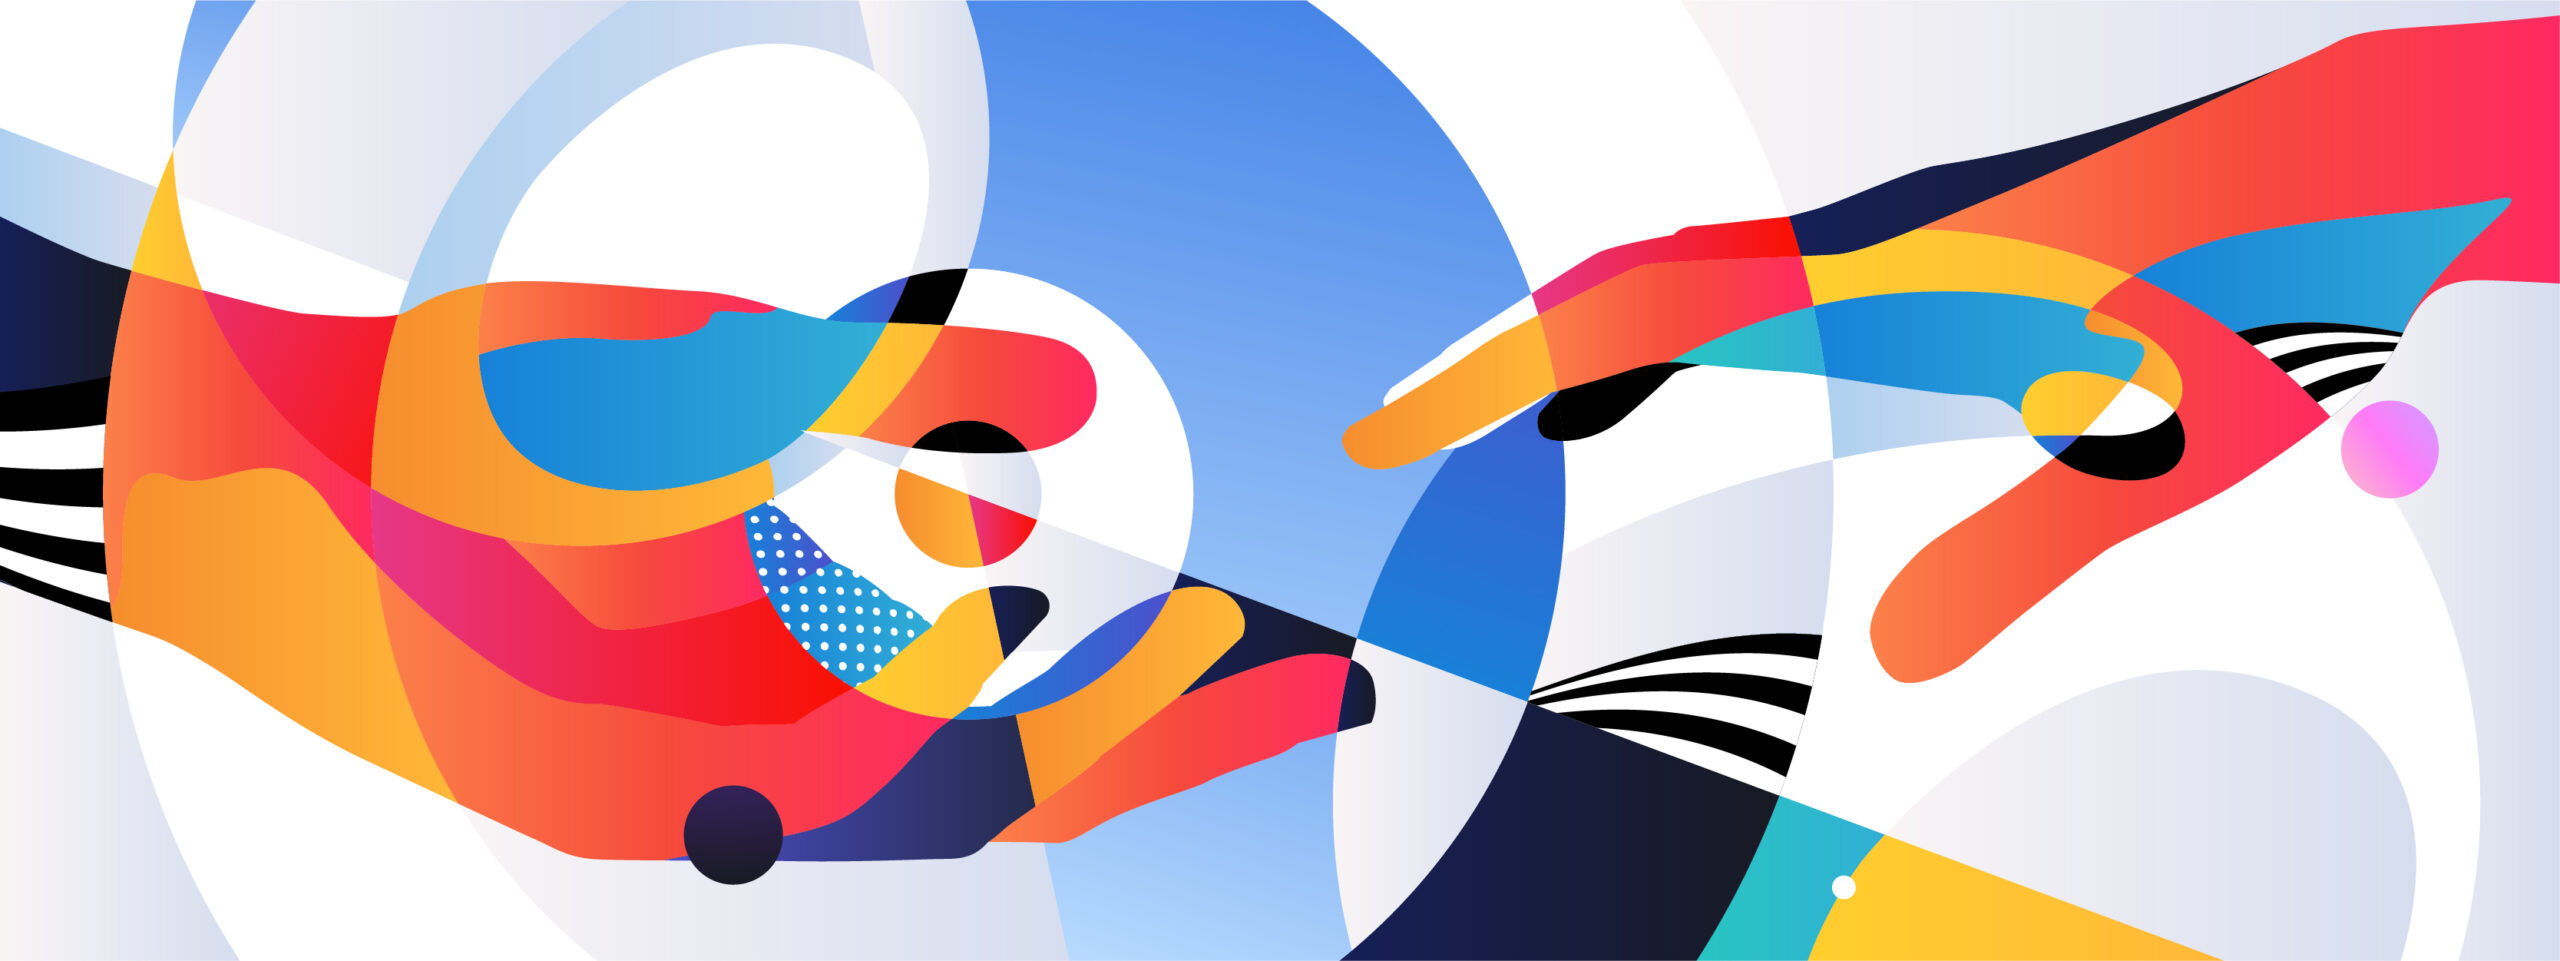 Adobe-datadeal-C